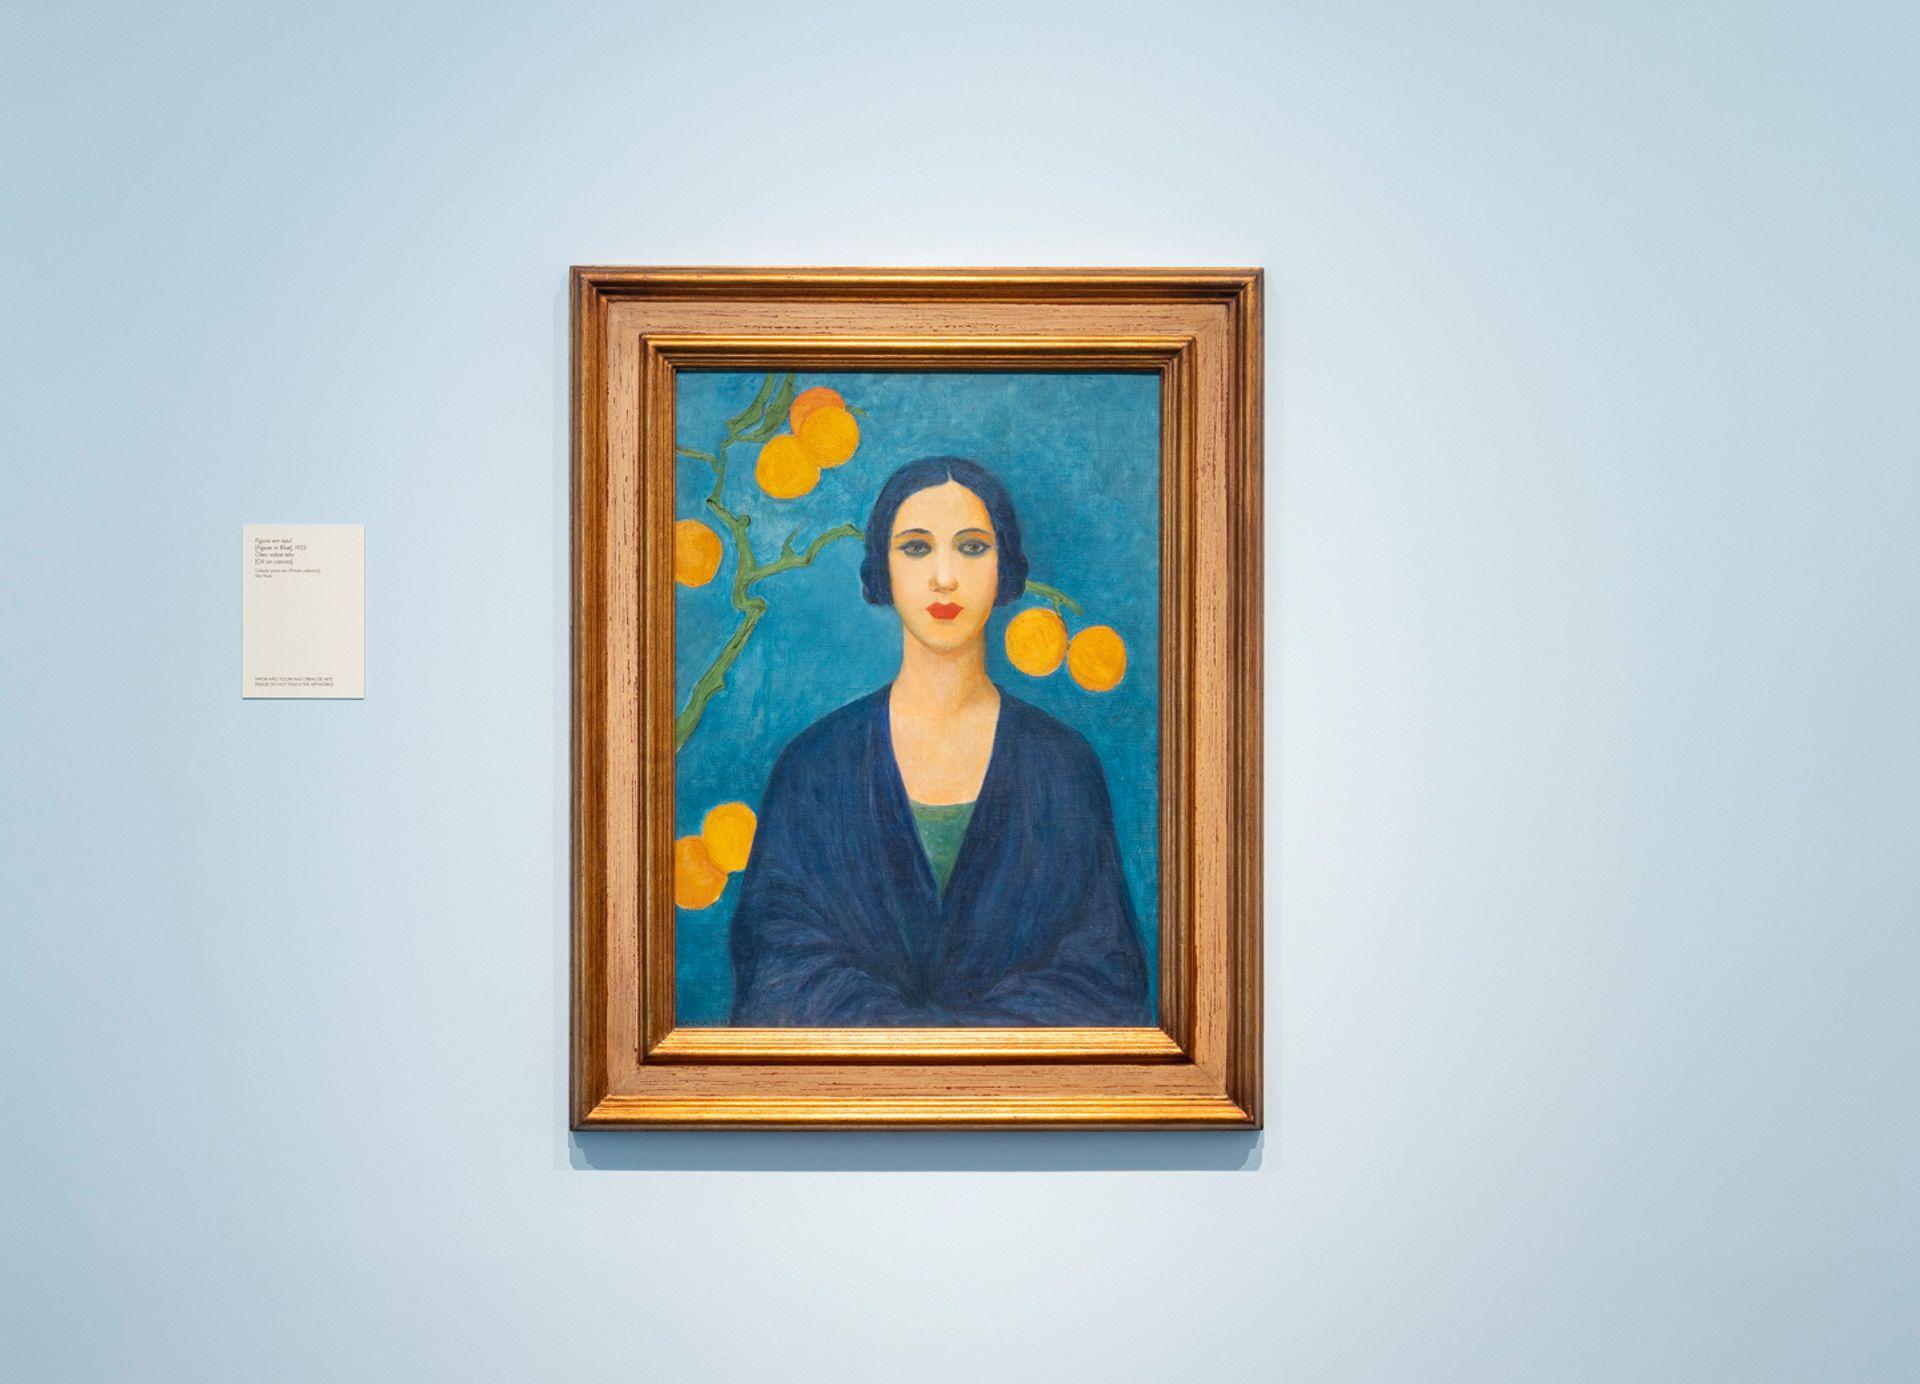 Tarsila do Amaral's Blue Figure (1923) in the Museum of Art of São Paulo Assis Chateaubriand's retrospective of the artist Eduardo Ortega